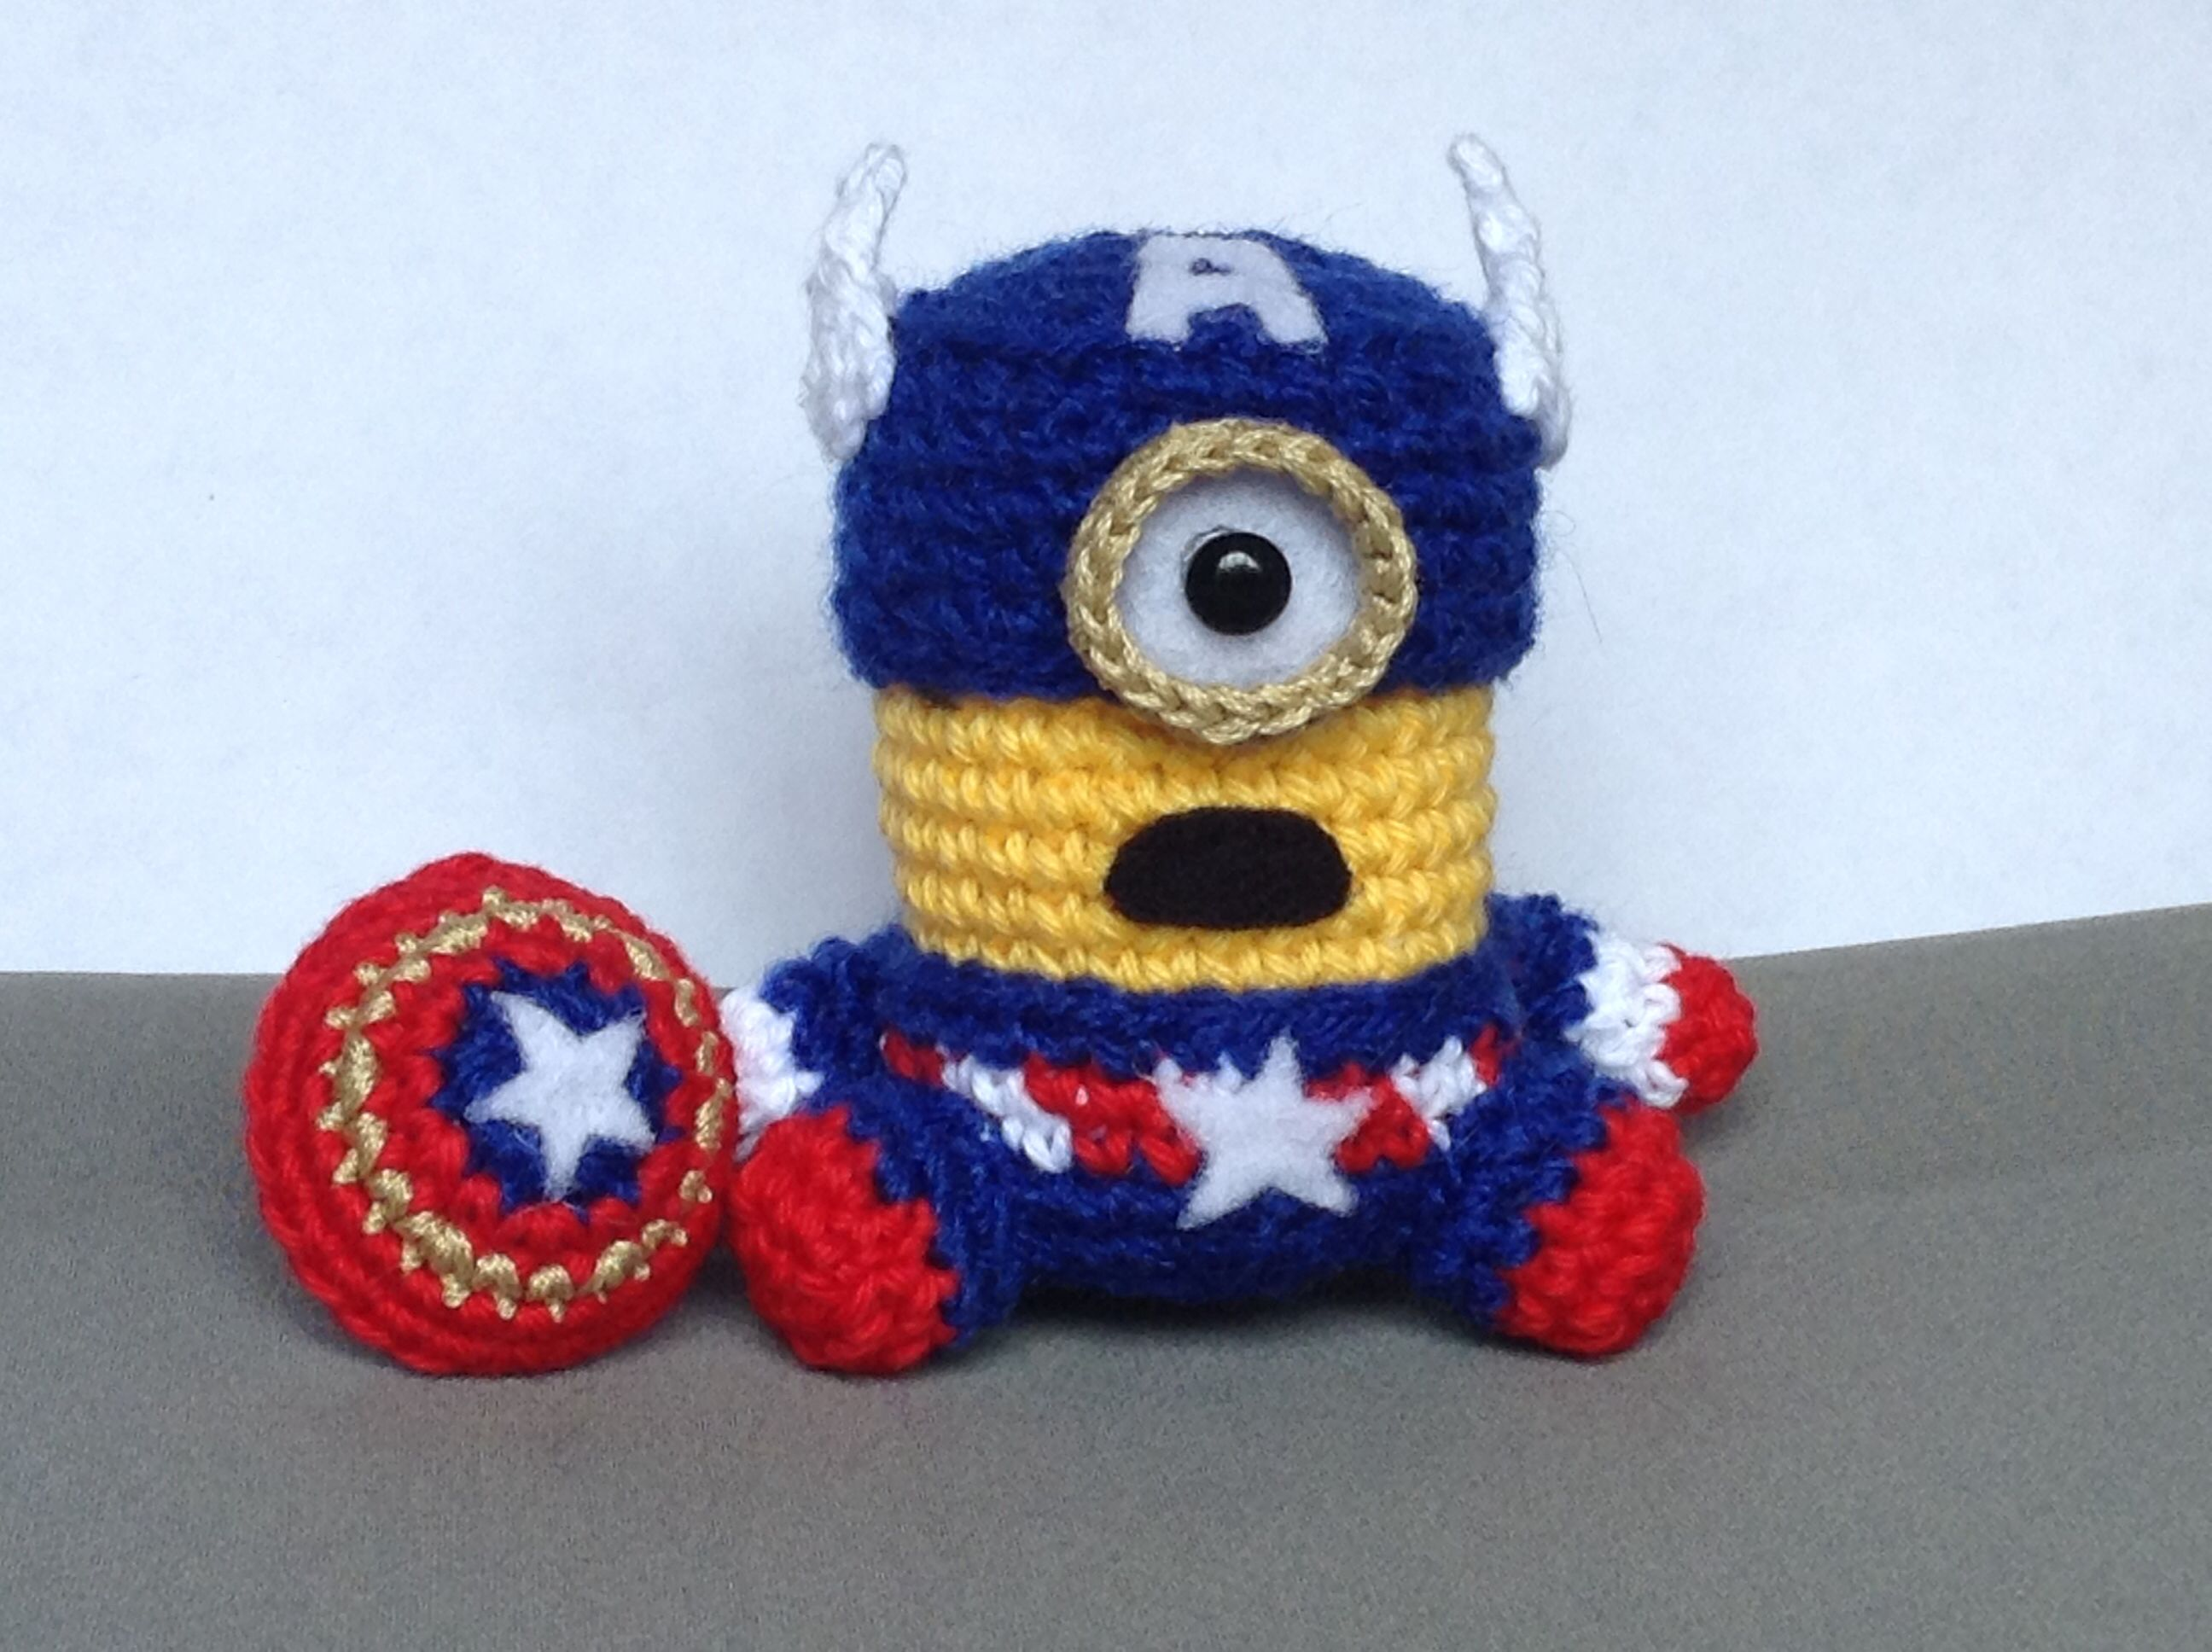 Patron Minion Amigurumi : Minion captain america crochet #amigurumi #handmade capitán américa